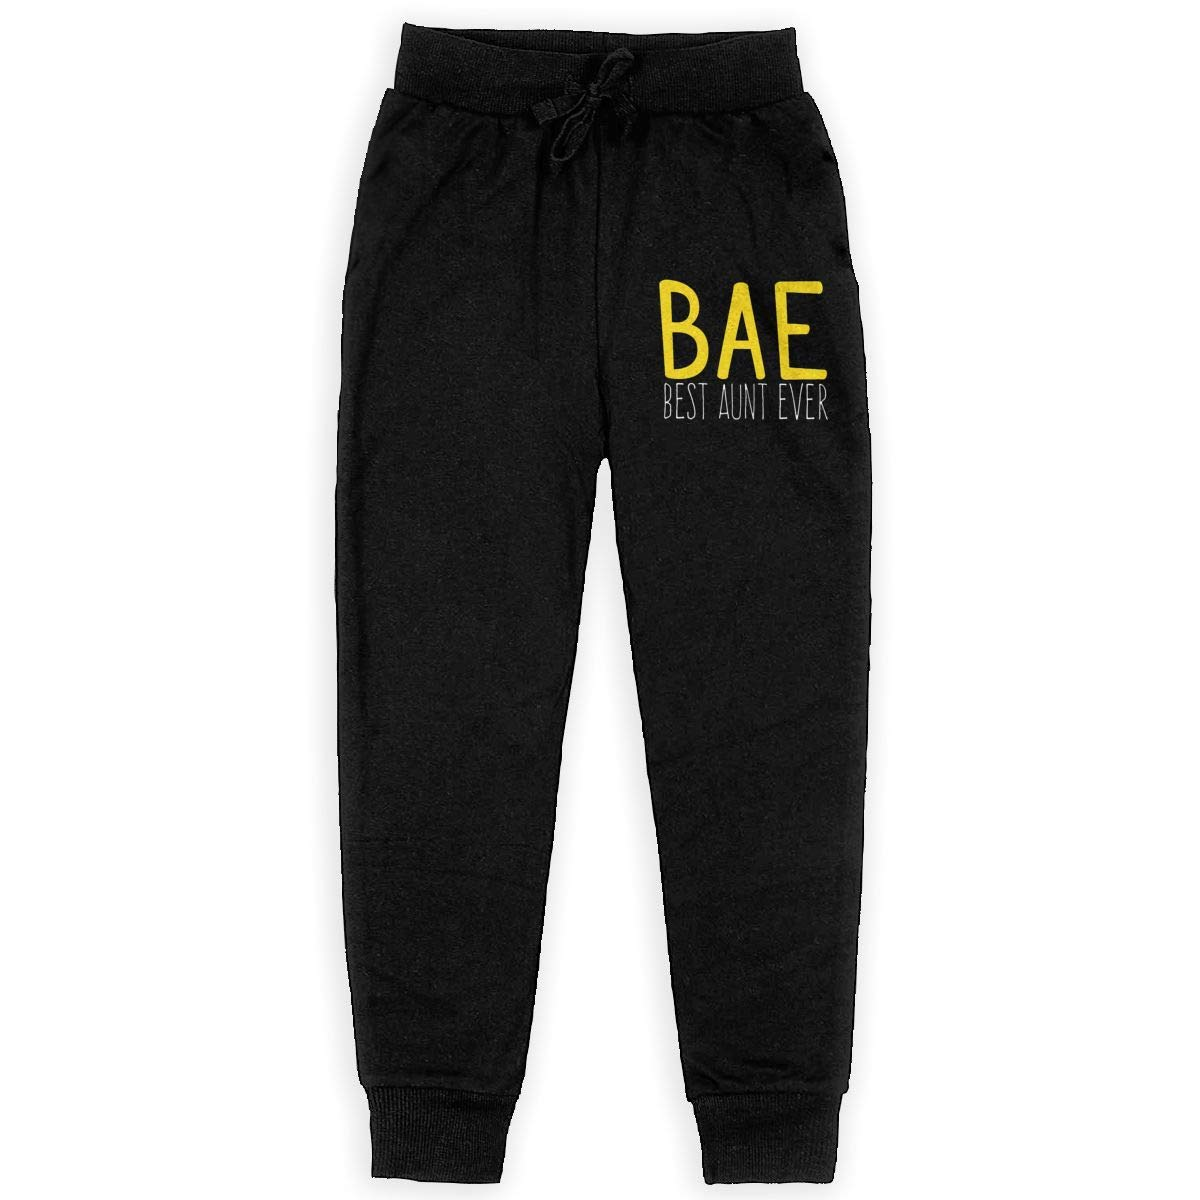 Dunpaiaa Bae Best Aunt Ever Boys Sweatpants,Joggers Sport Training Pants Trousers Black